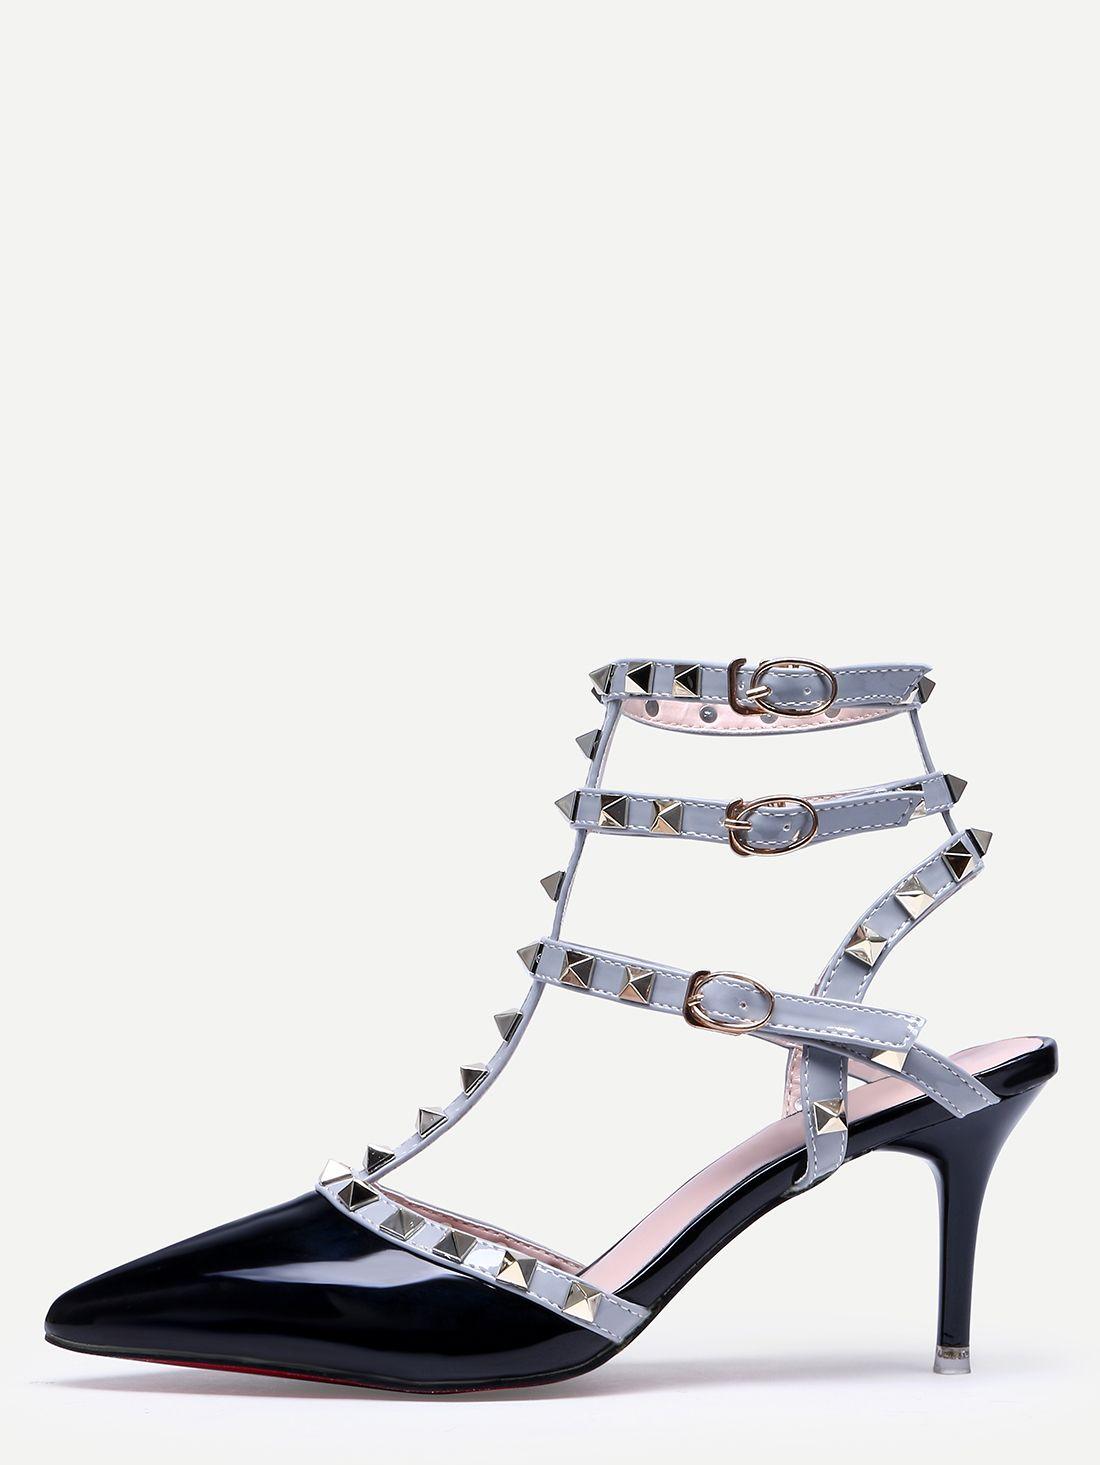 67baa3dfc5cd Black Pointed Toe Buckle Strap Studded Stiletto Heels -SheIn(Sheinside)